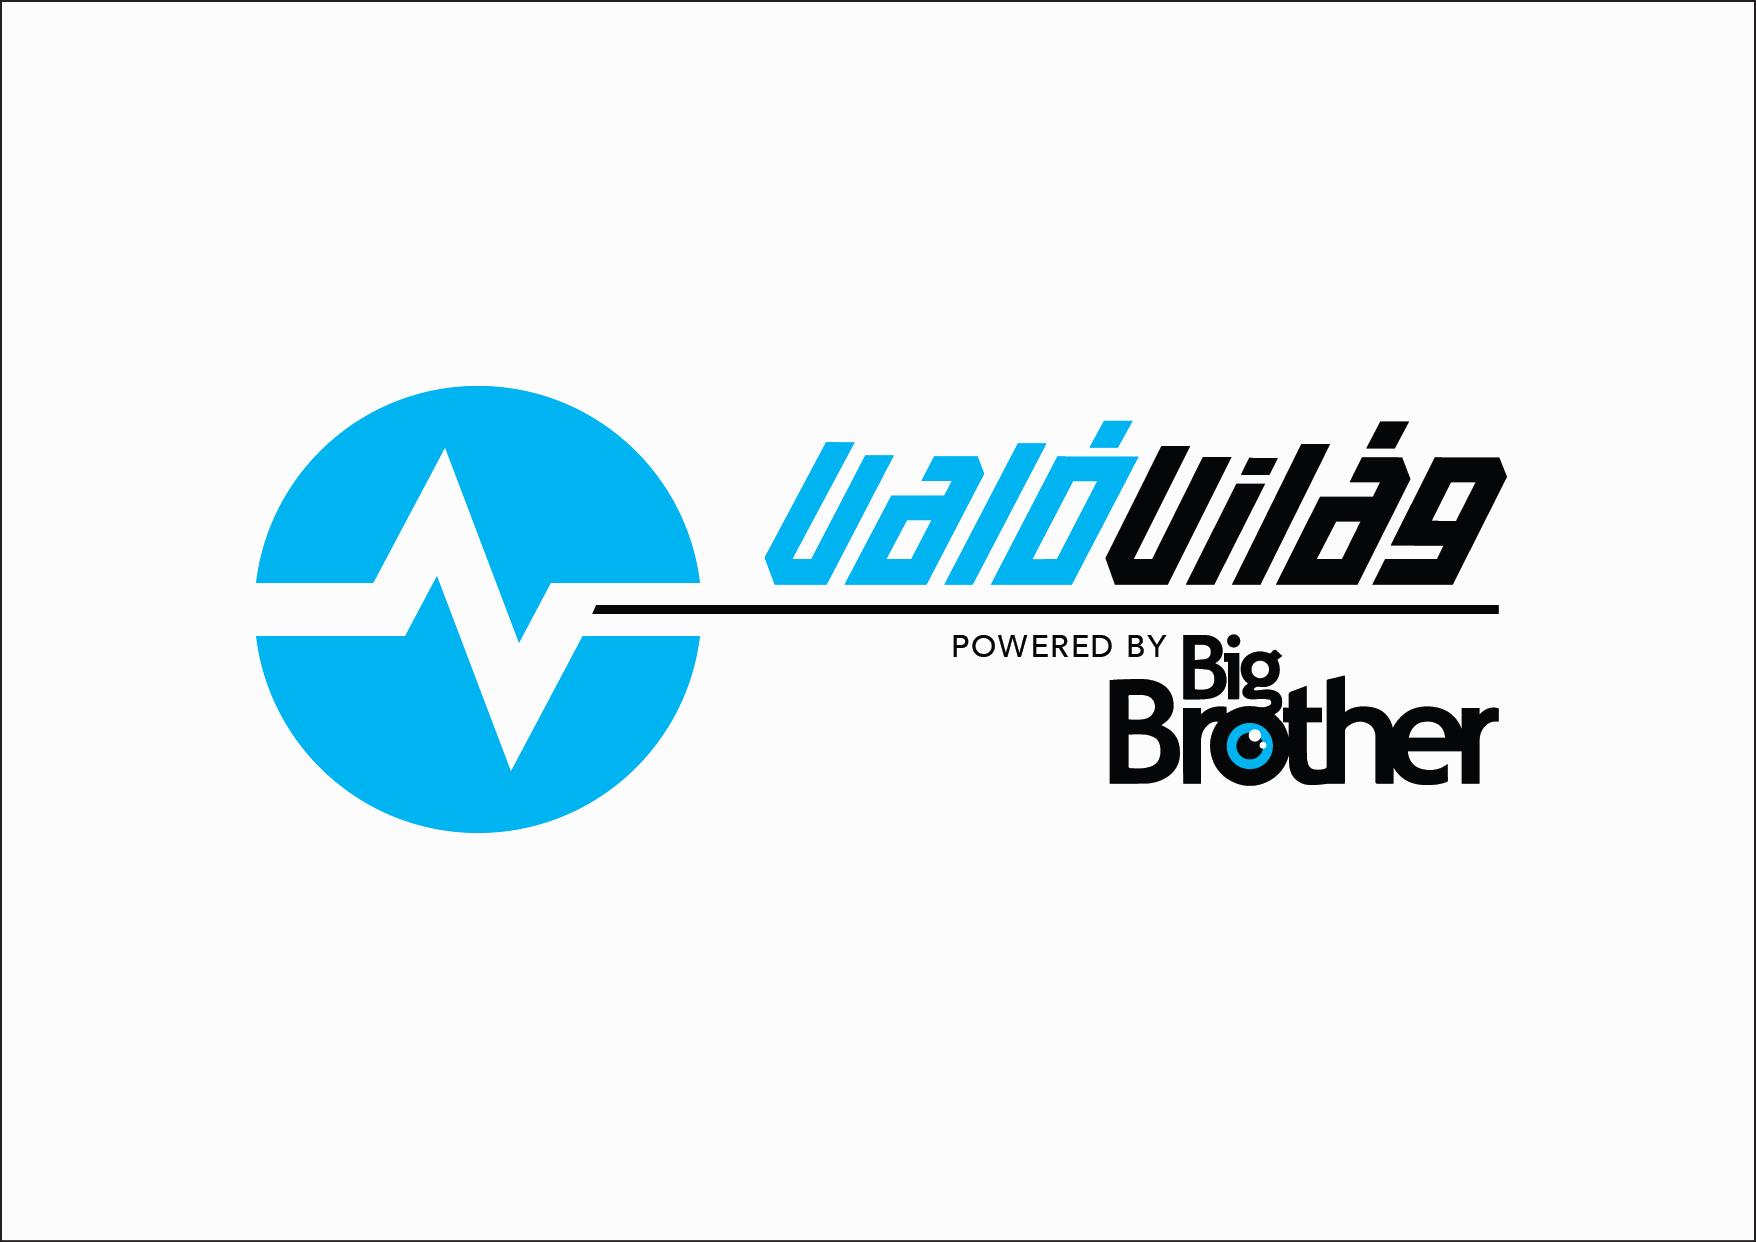 vvbb_logo.jpg